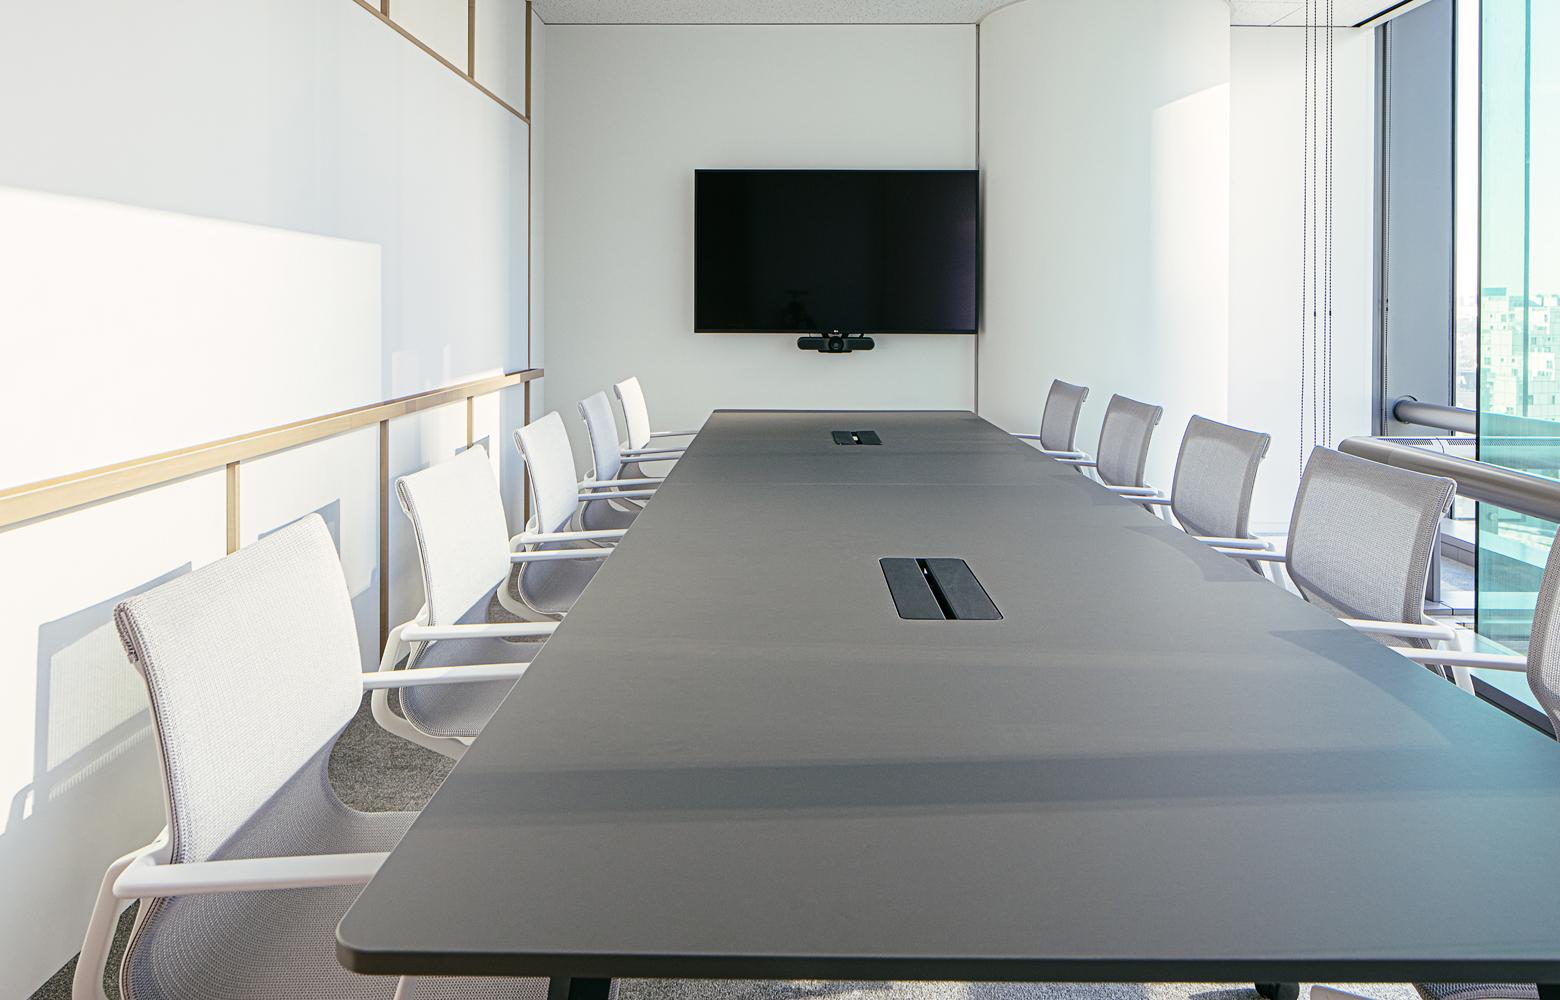 Secret Office Meeting Room_4 デザイン・レイアウト事例